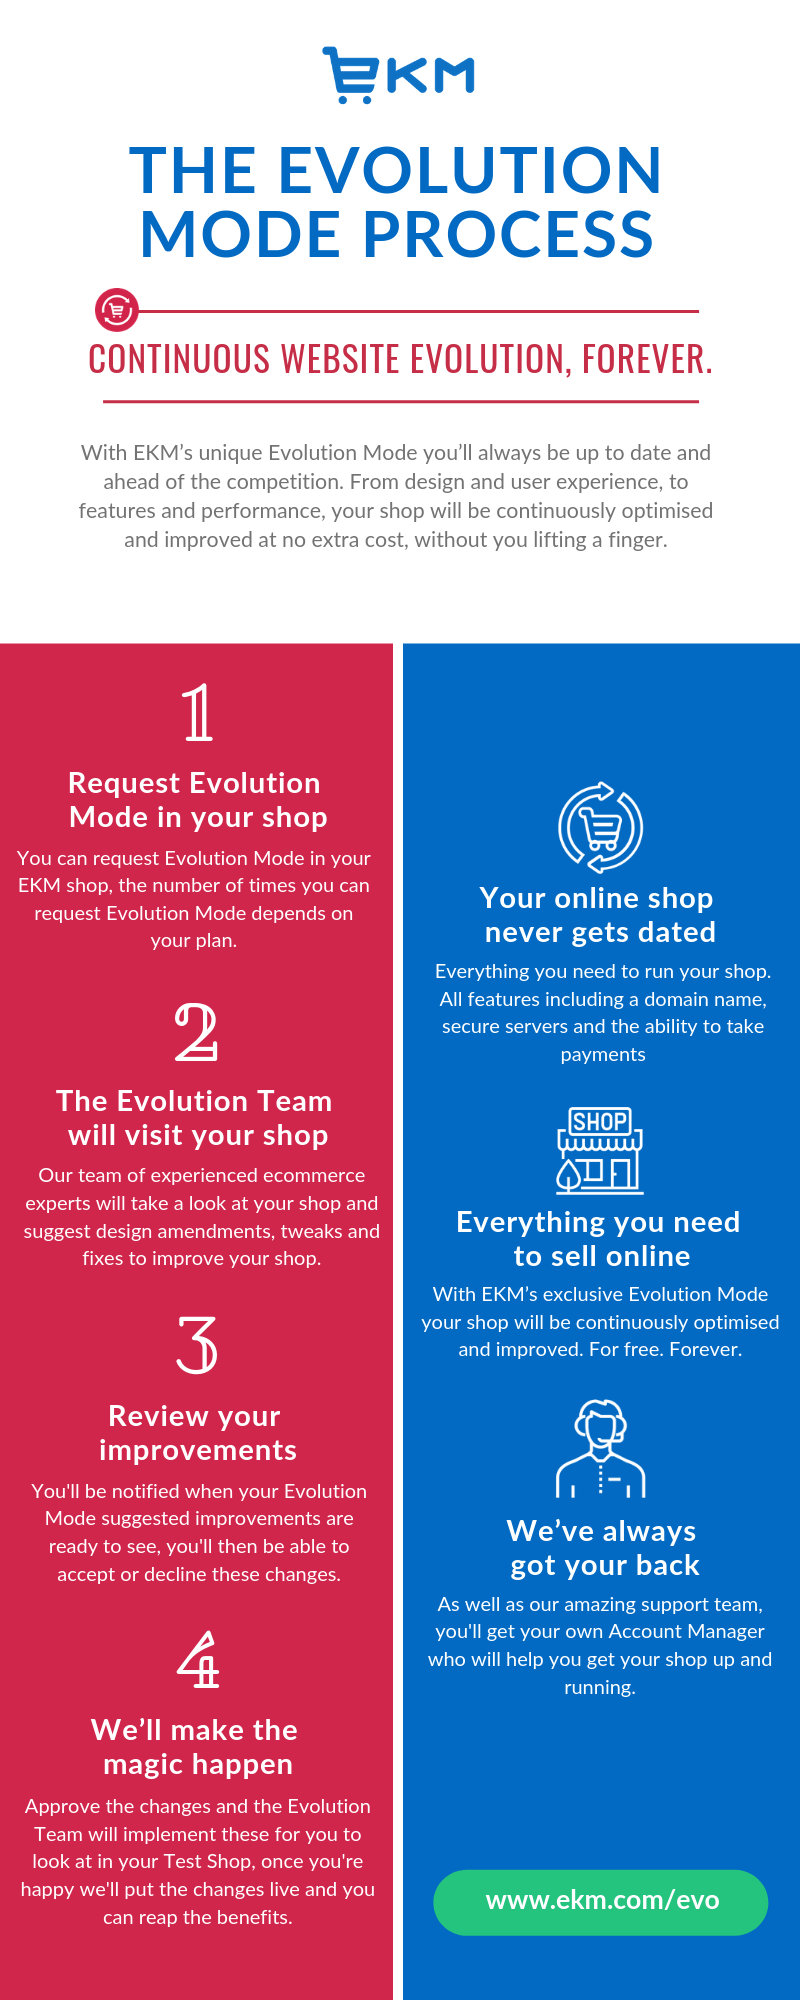 Evolution Mode - The process